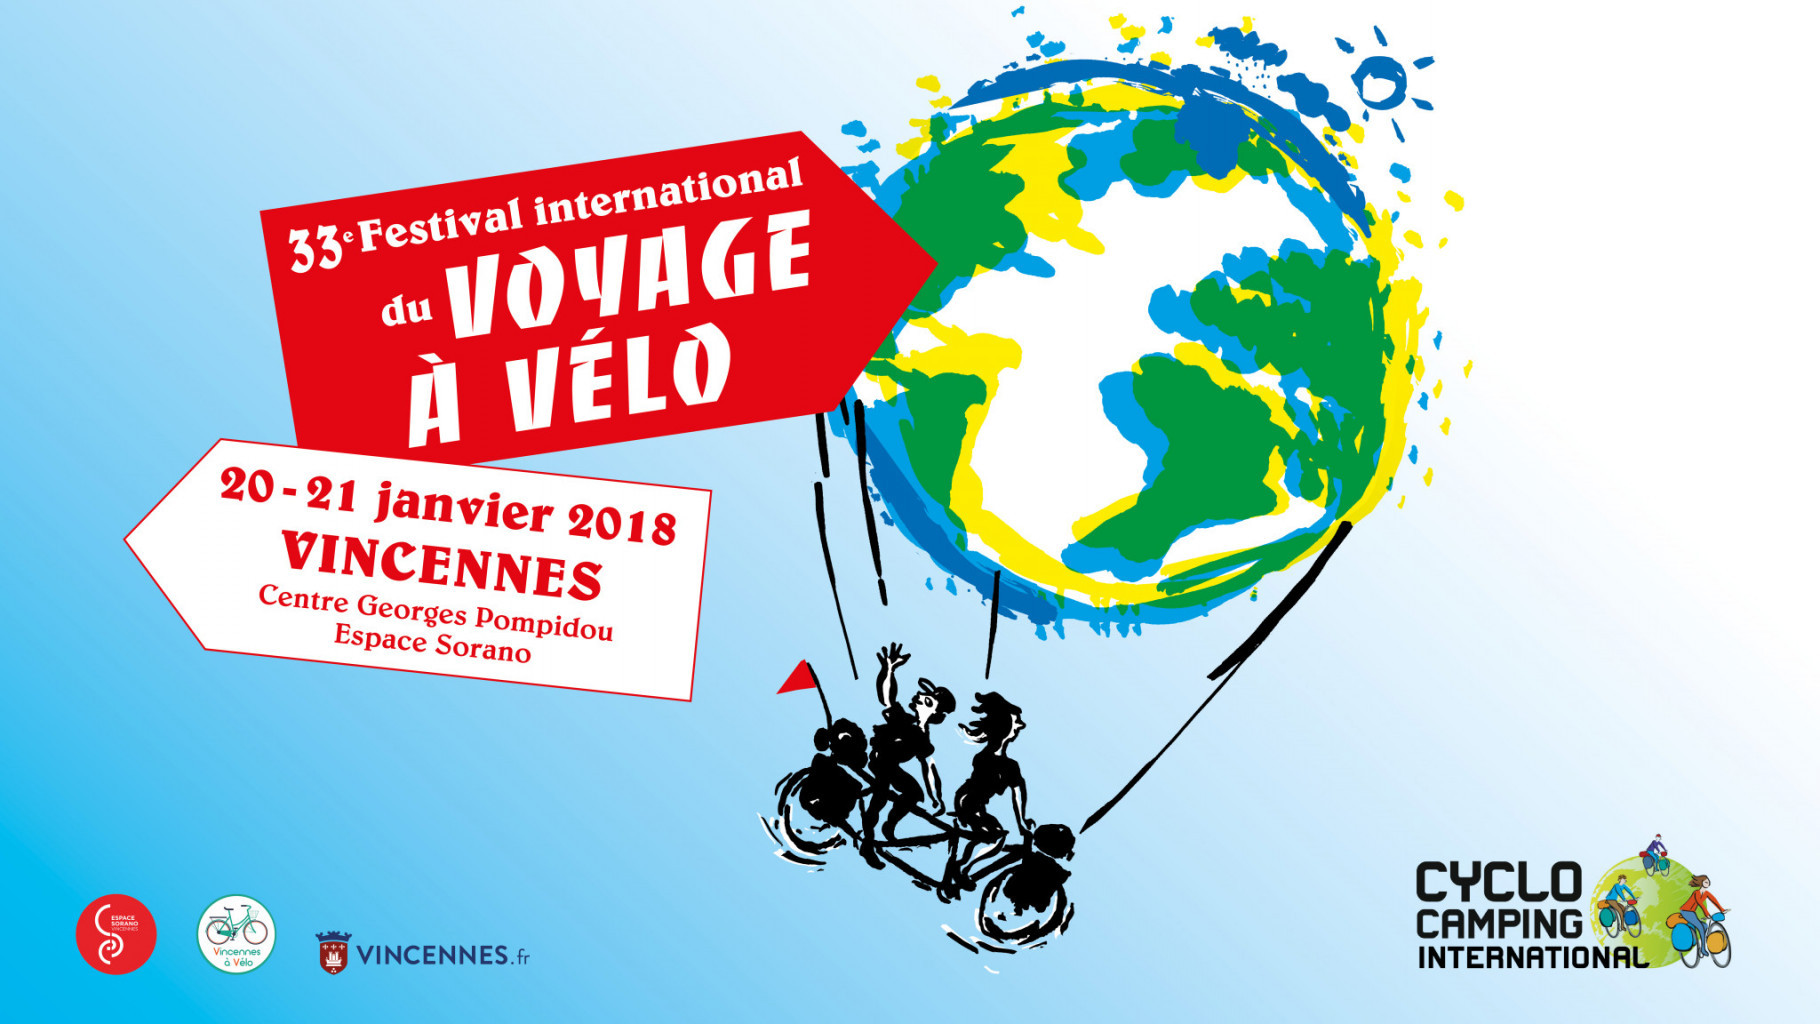 Projection festival cyclo camping international le 21 janvier à 10h30